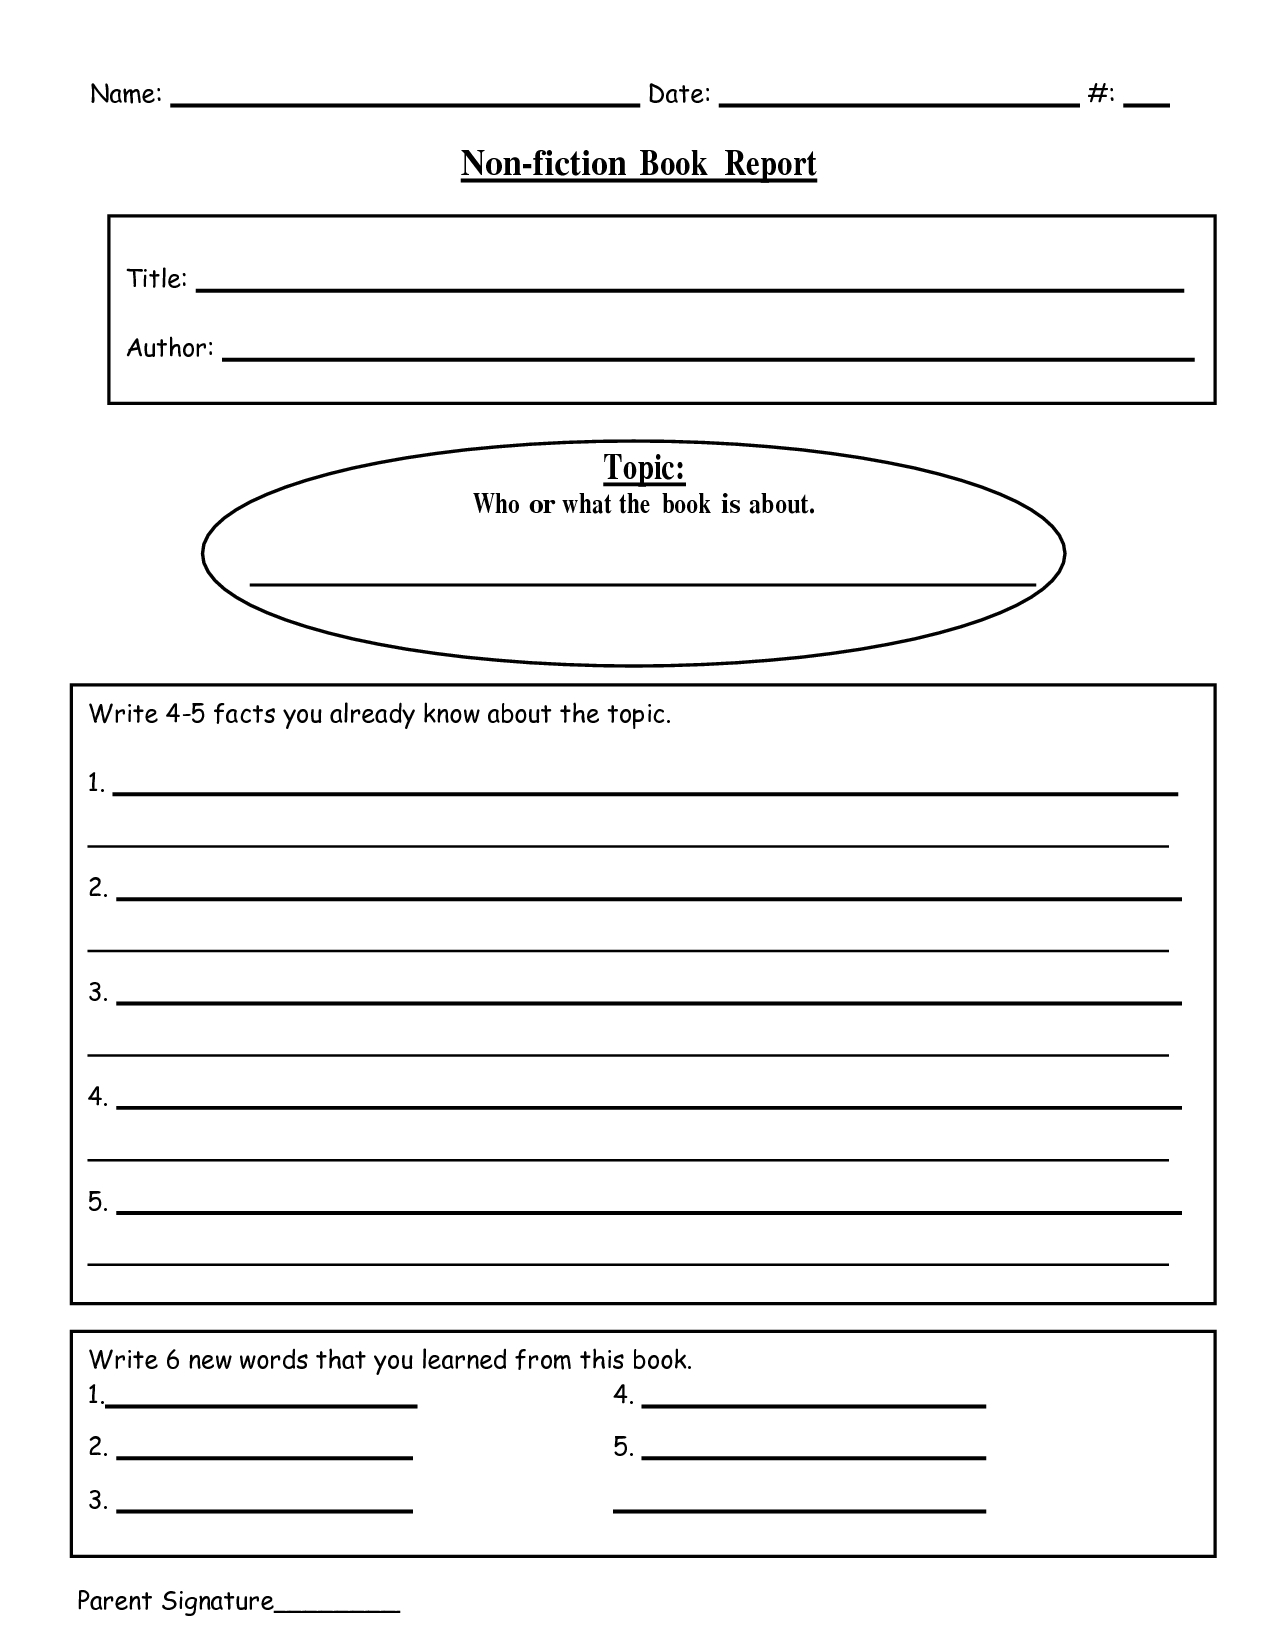 Free Printable Book Report Templates   Non-Fiction Book Report.doc - Free Printable Book Report Forms For Second Grade